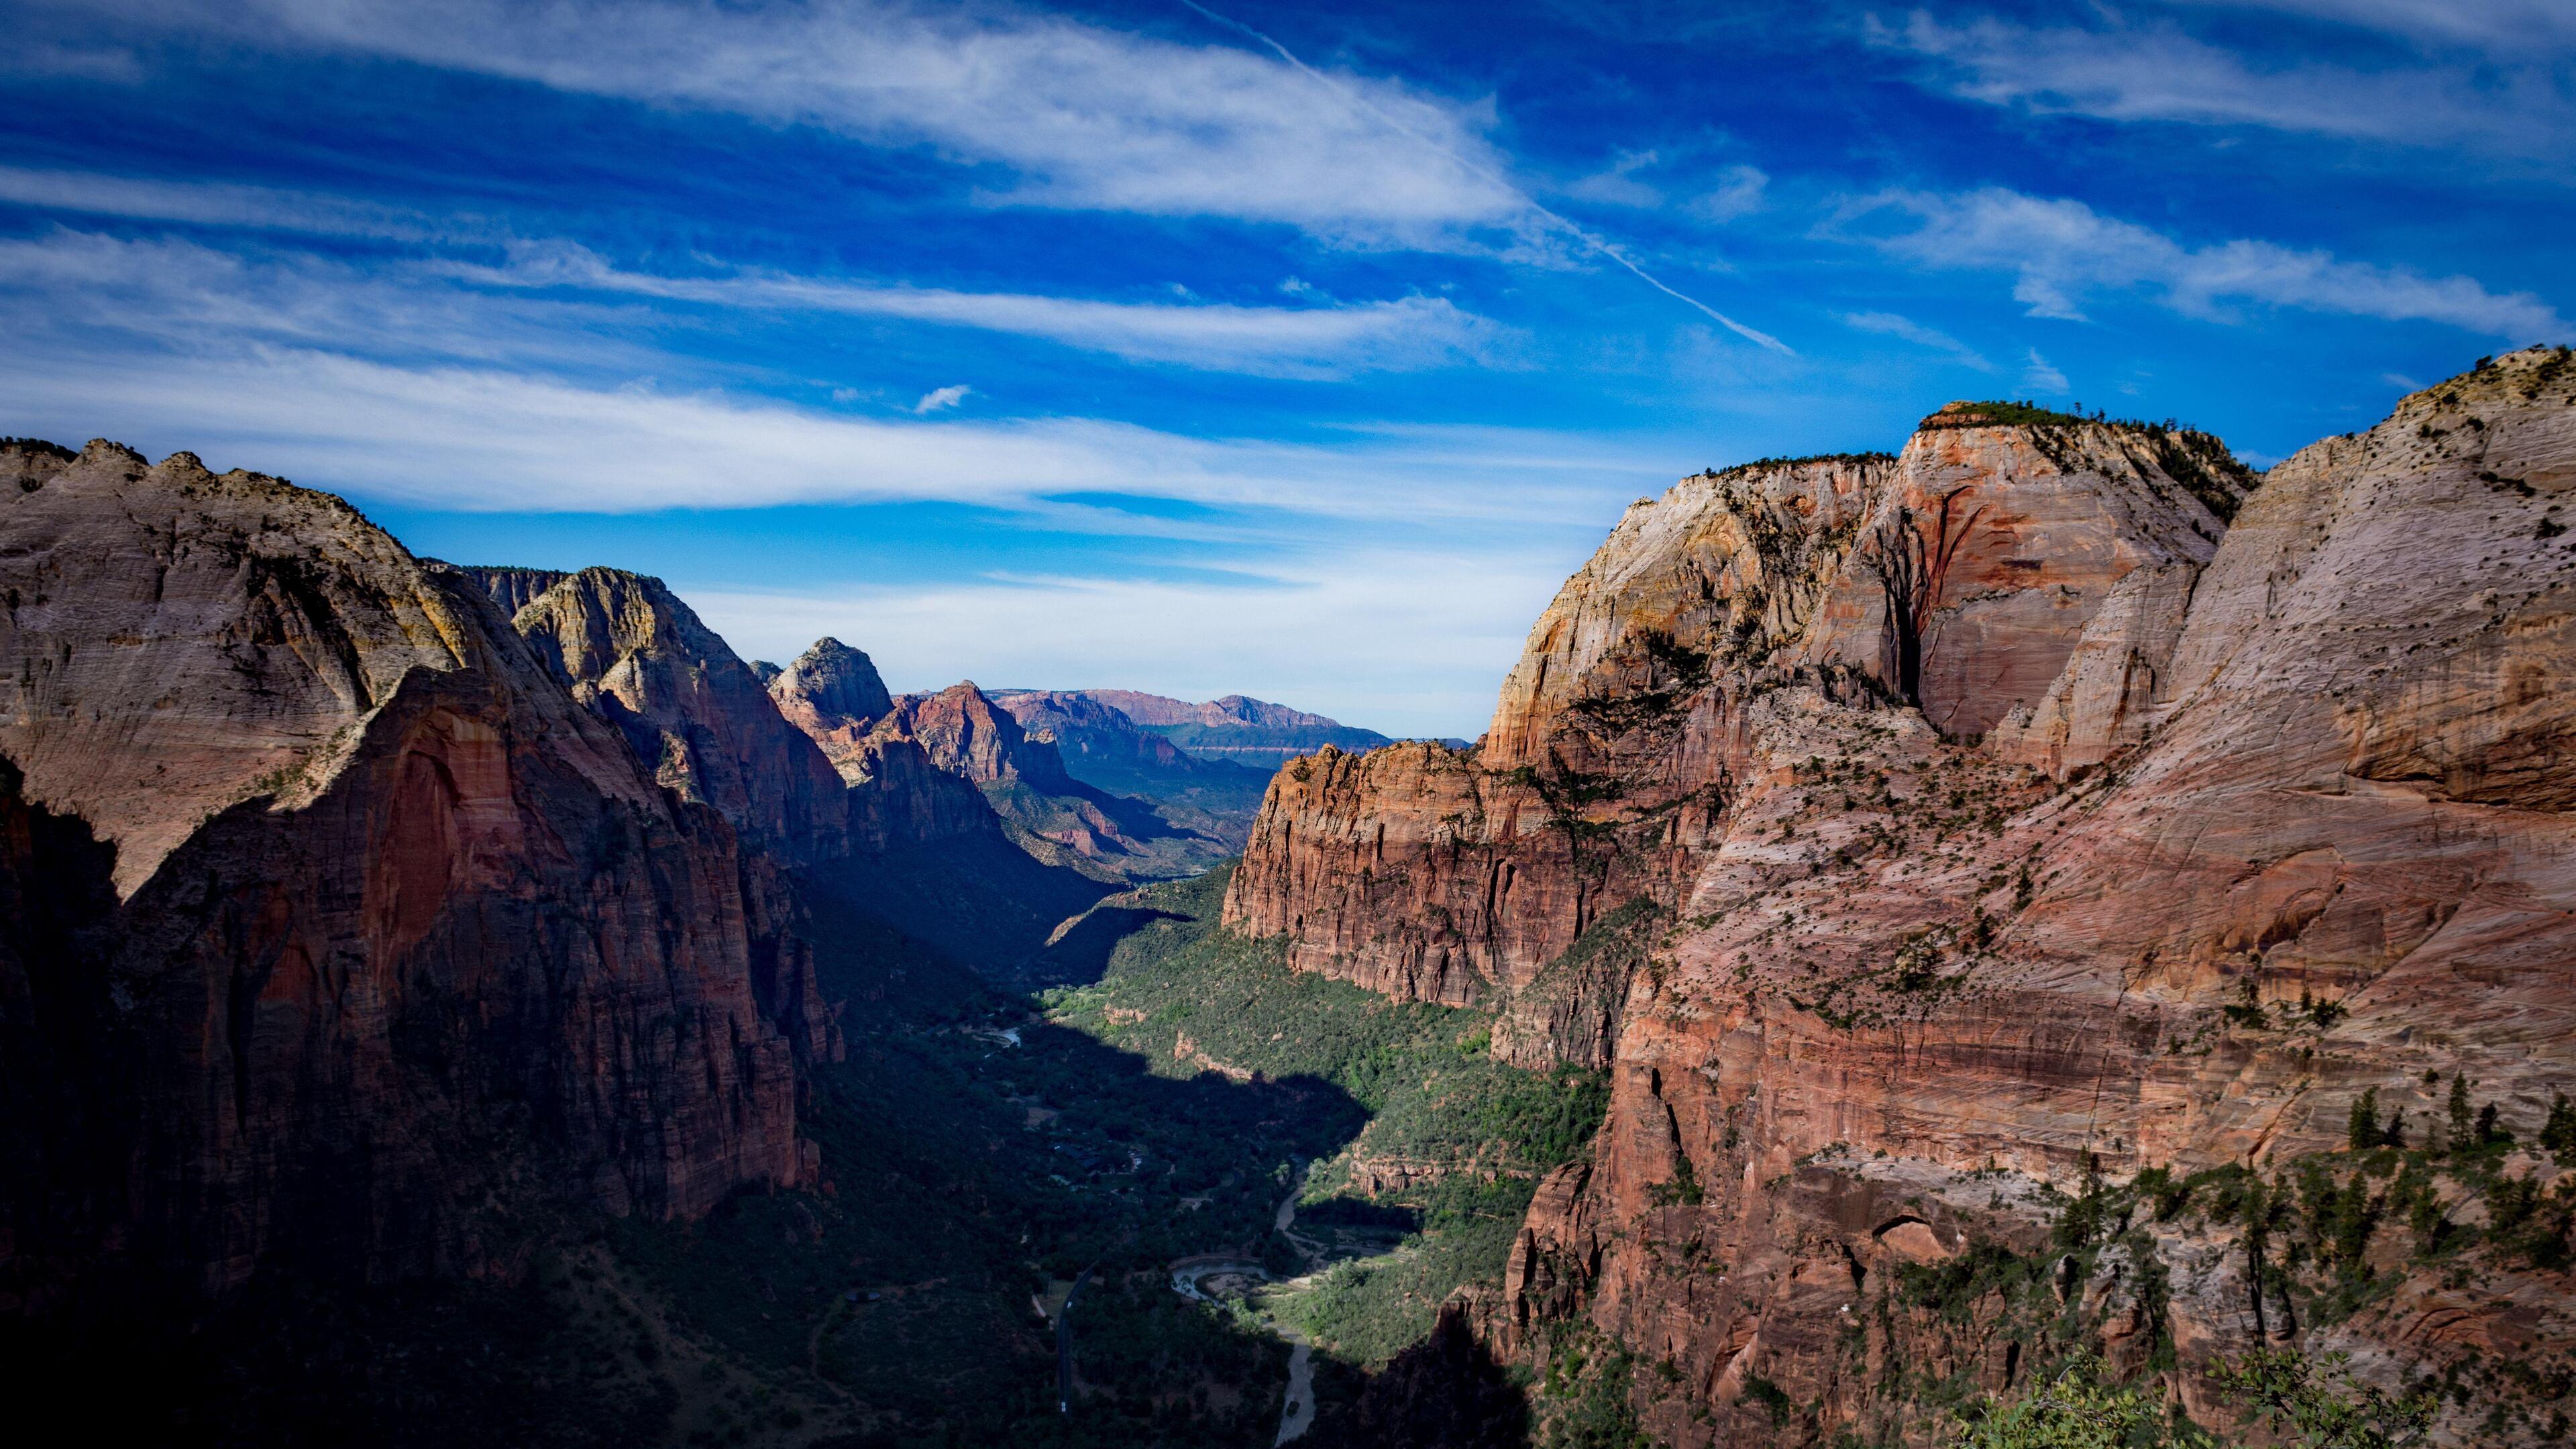 zion-national-park-5k-6t.jpg